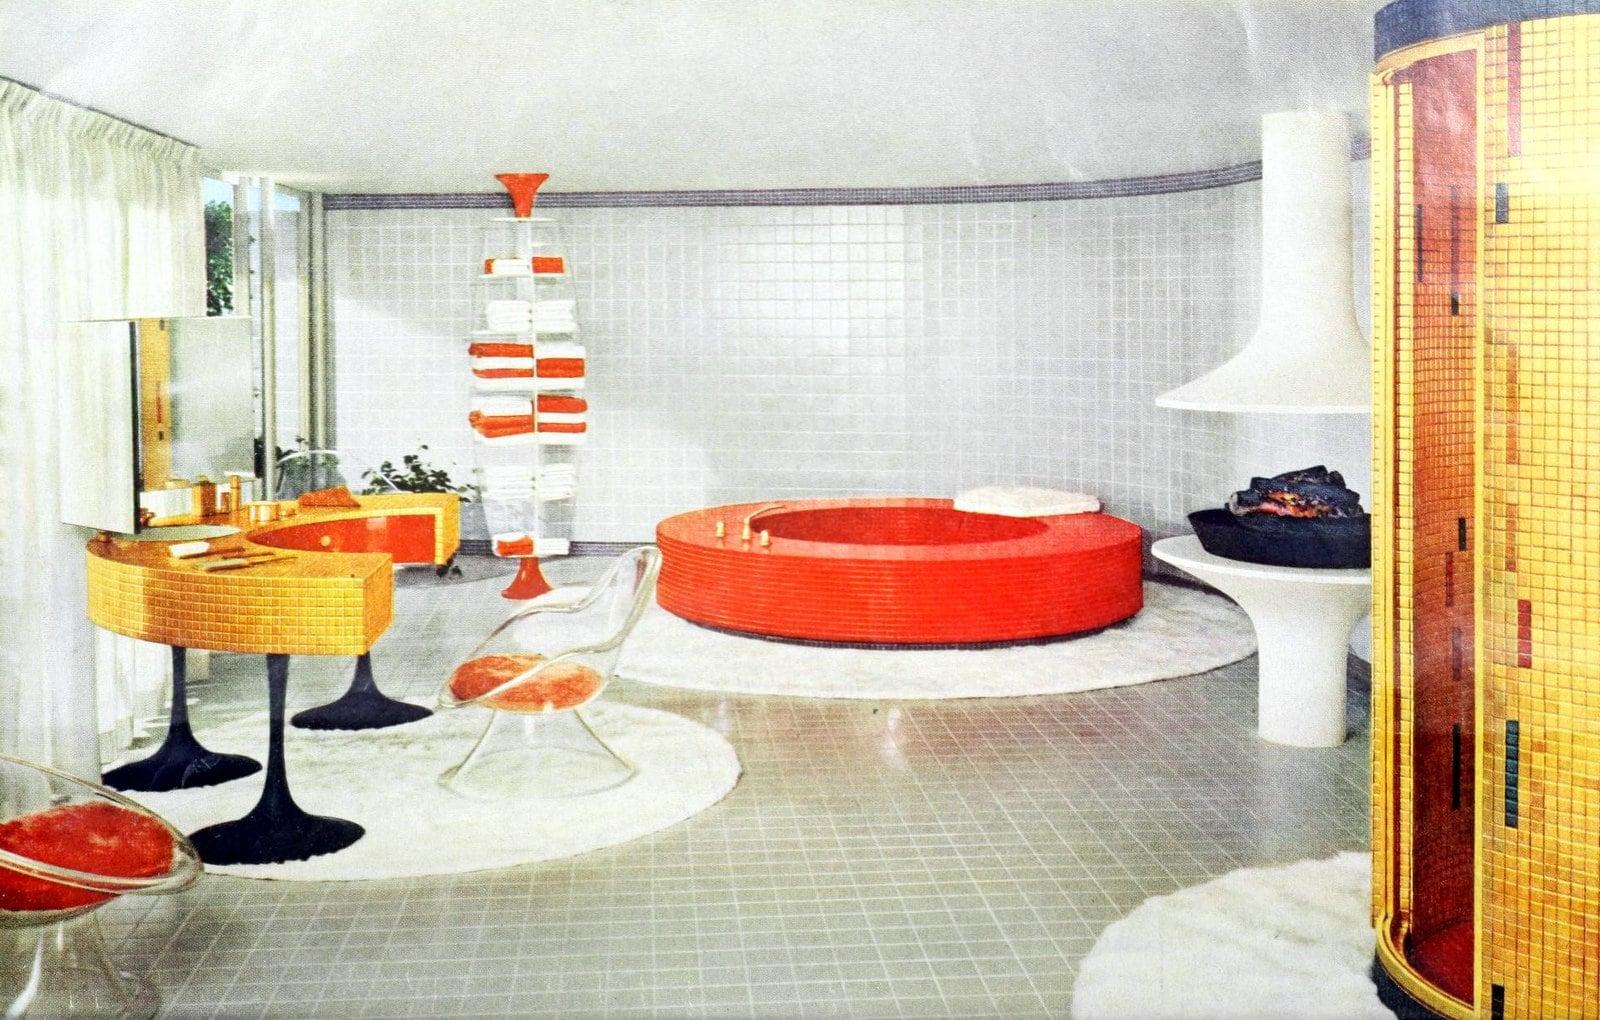 Unique vintage bathroom design with round orange bathtub (1961)